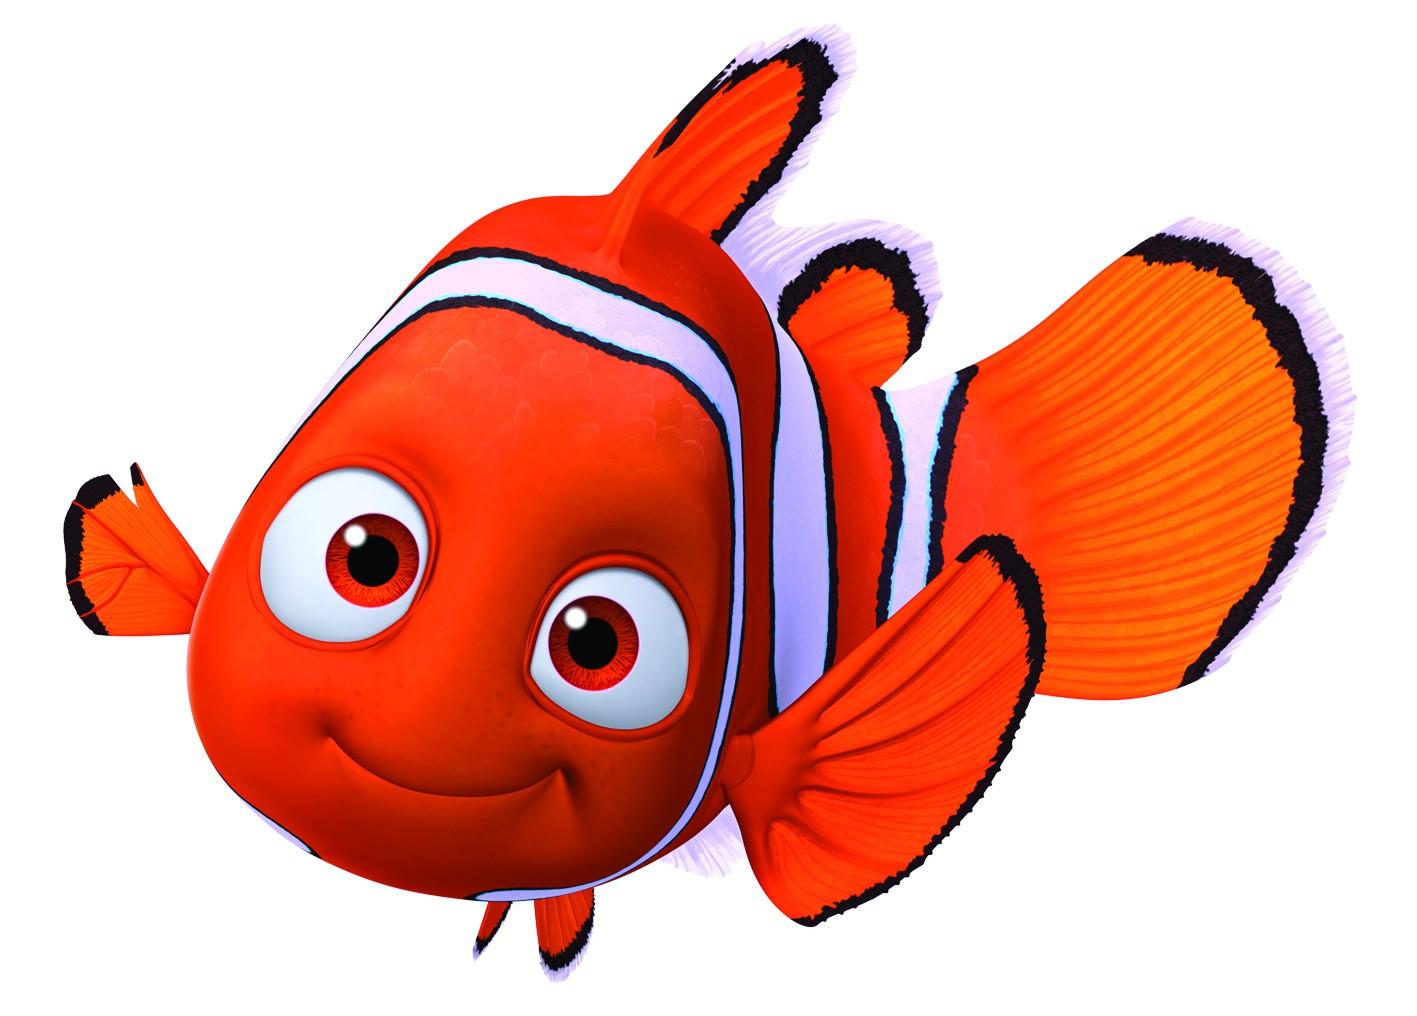 Nemo_Promo_5.jpg